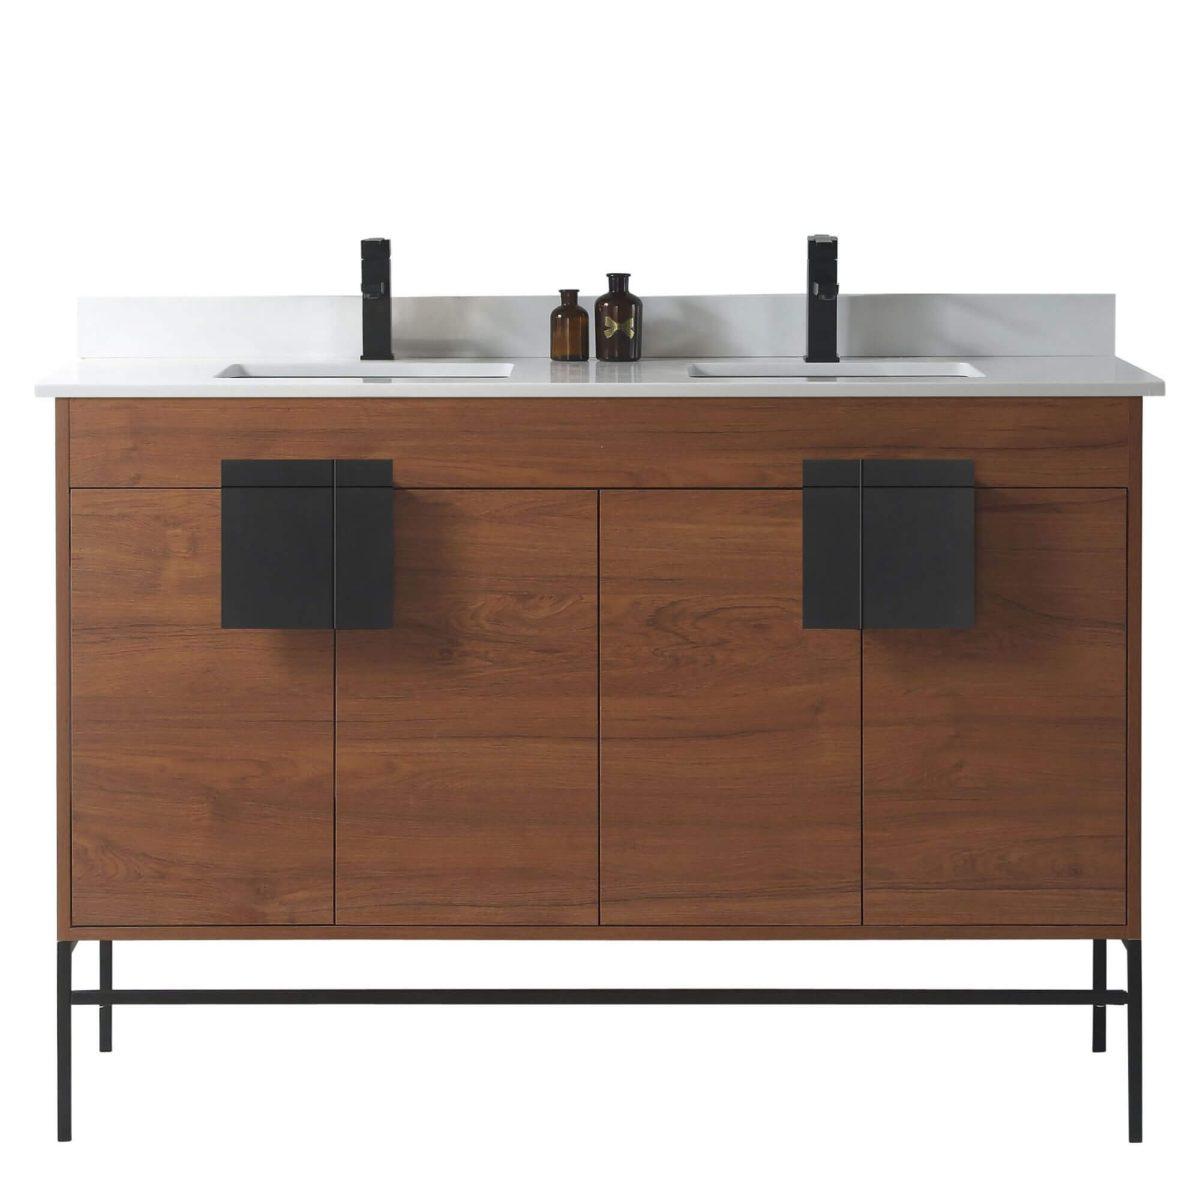 "Shawbridge 60"" Modern Double Bathroom Vanity  Spicy Walnut with Black Hardware"